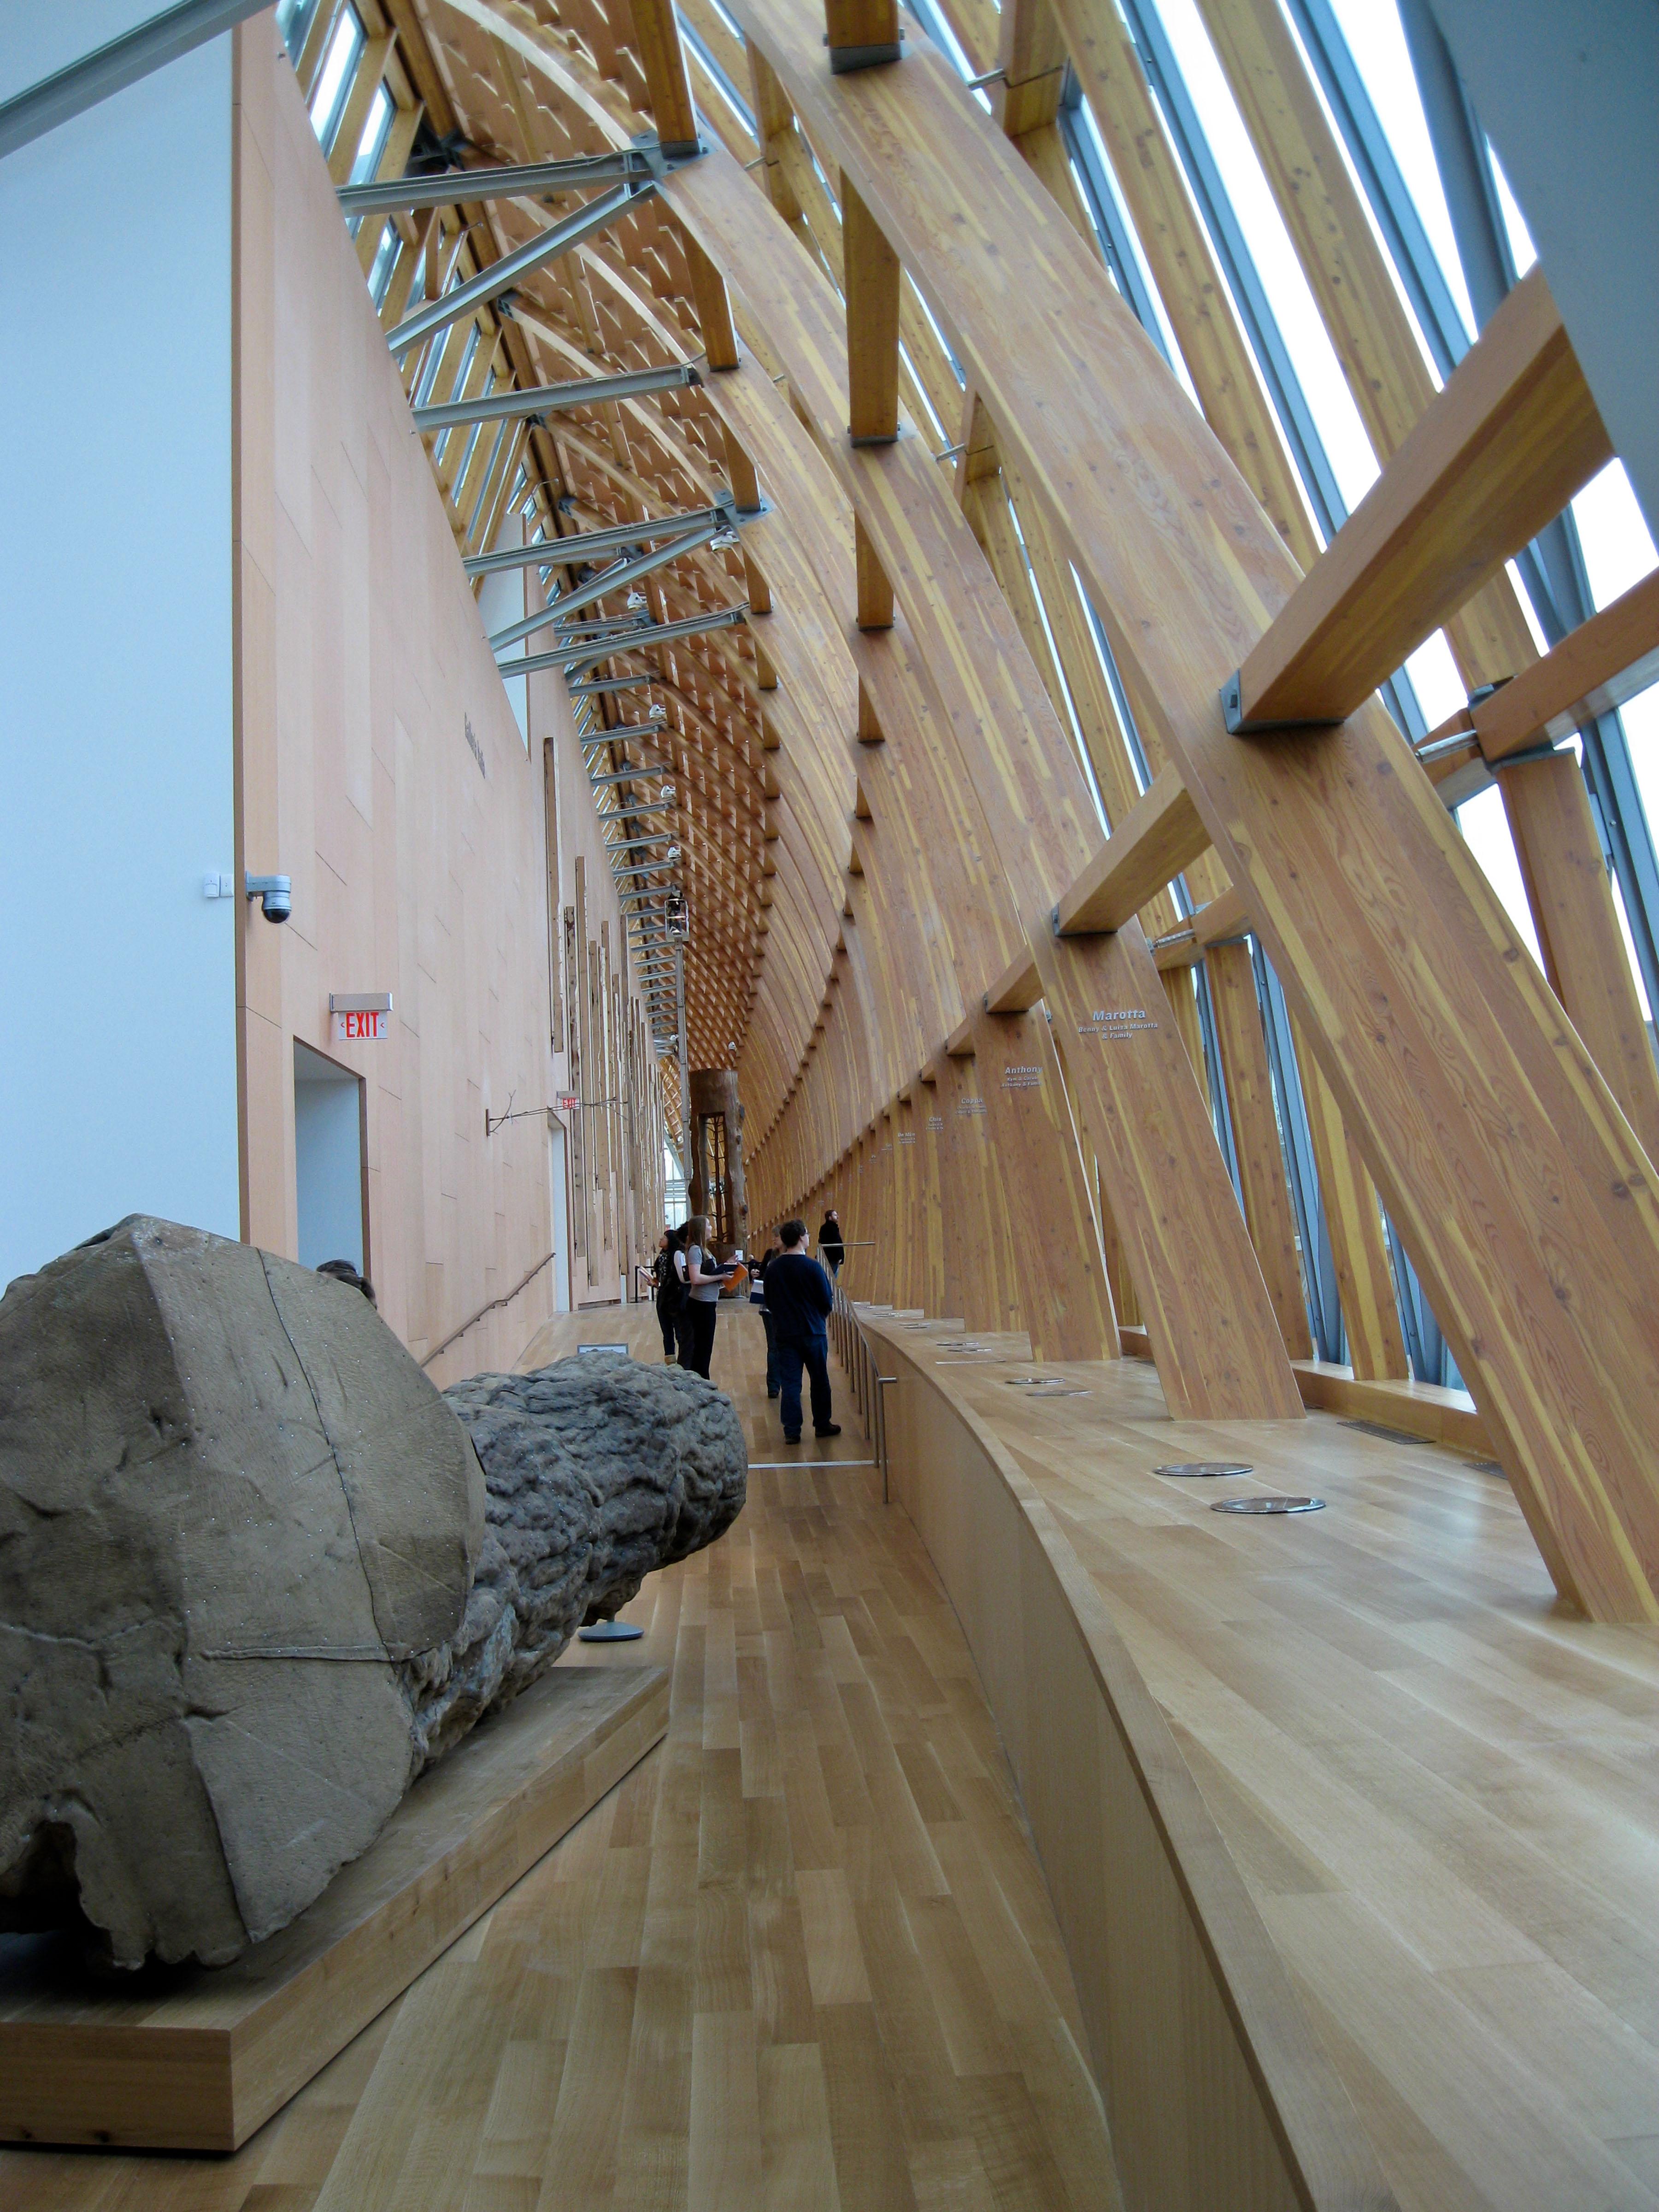 Newly renovated Art Gallery of Ontario (AGO) in Toronto, Ontario, Canada